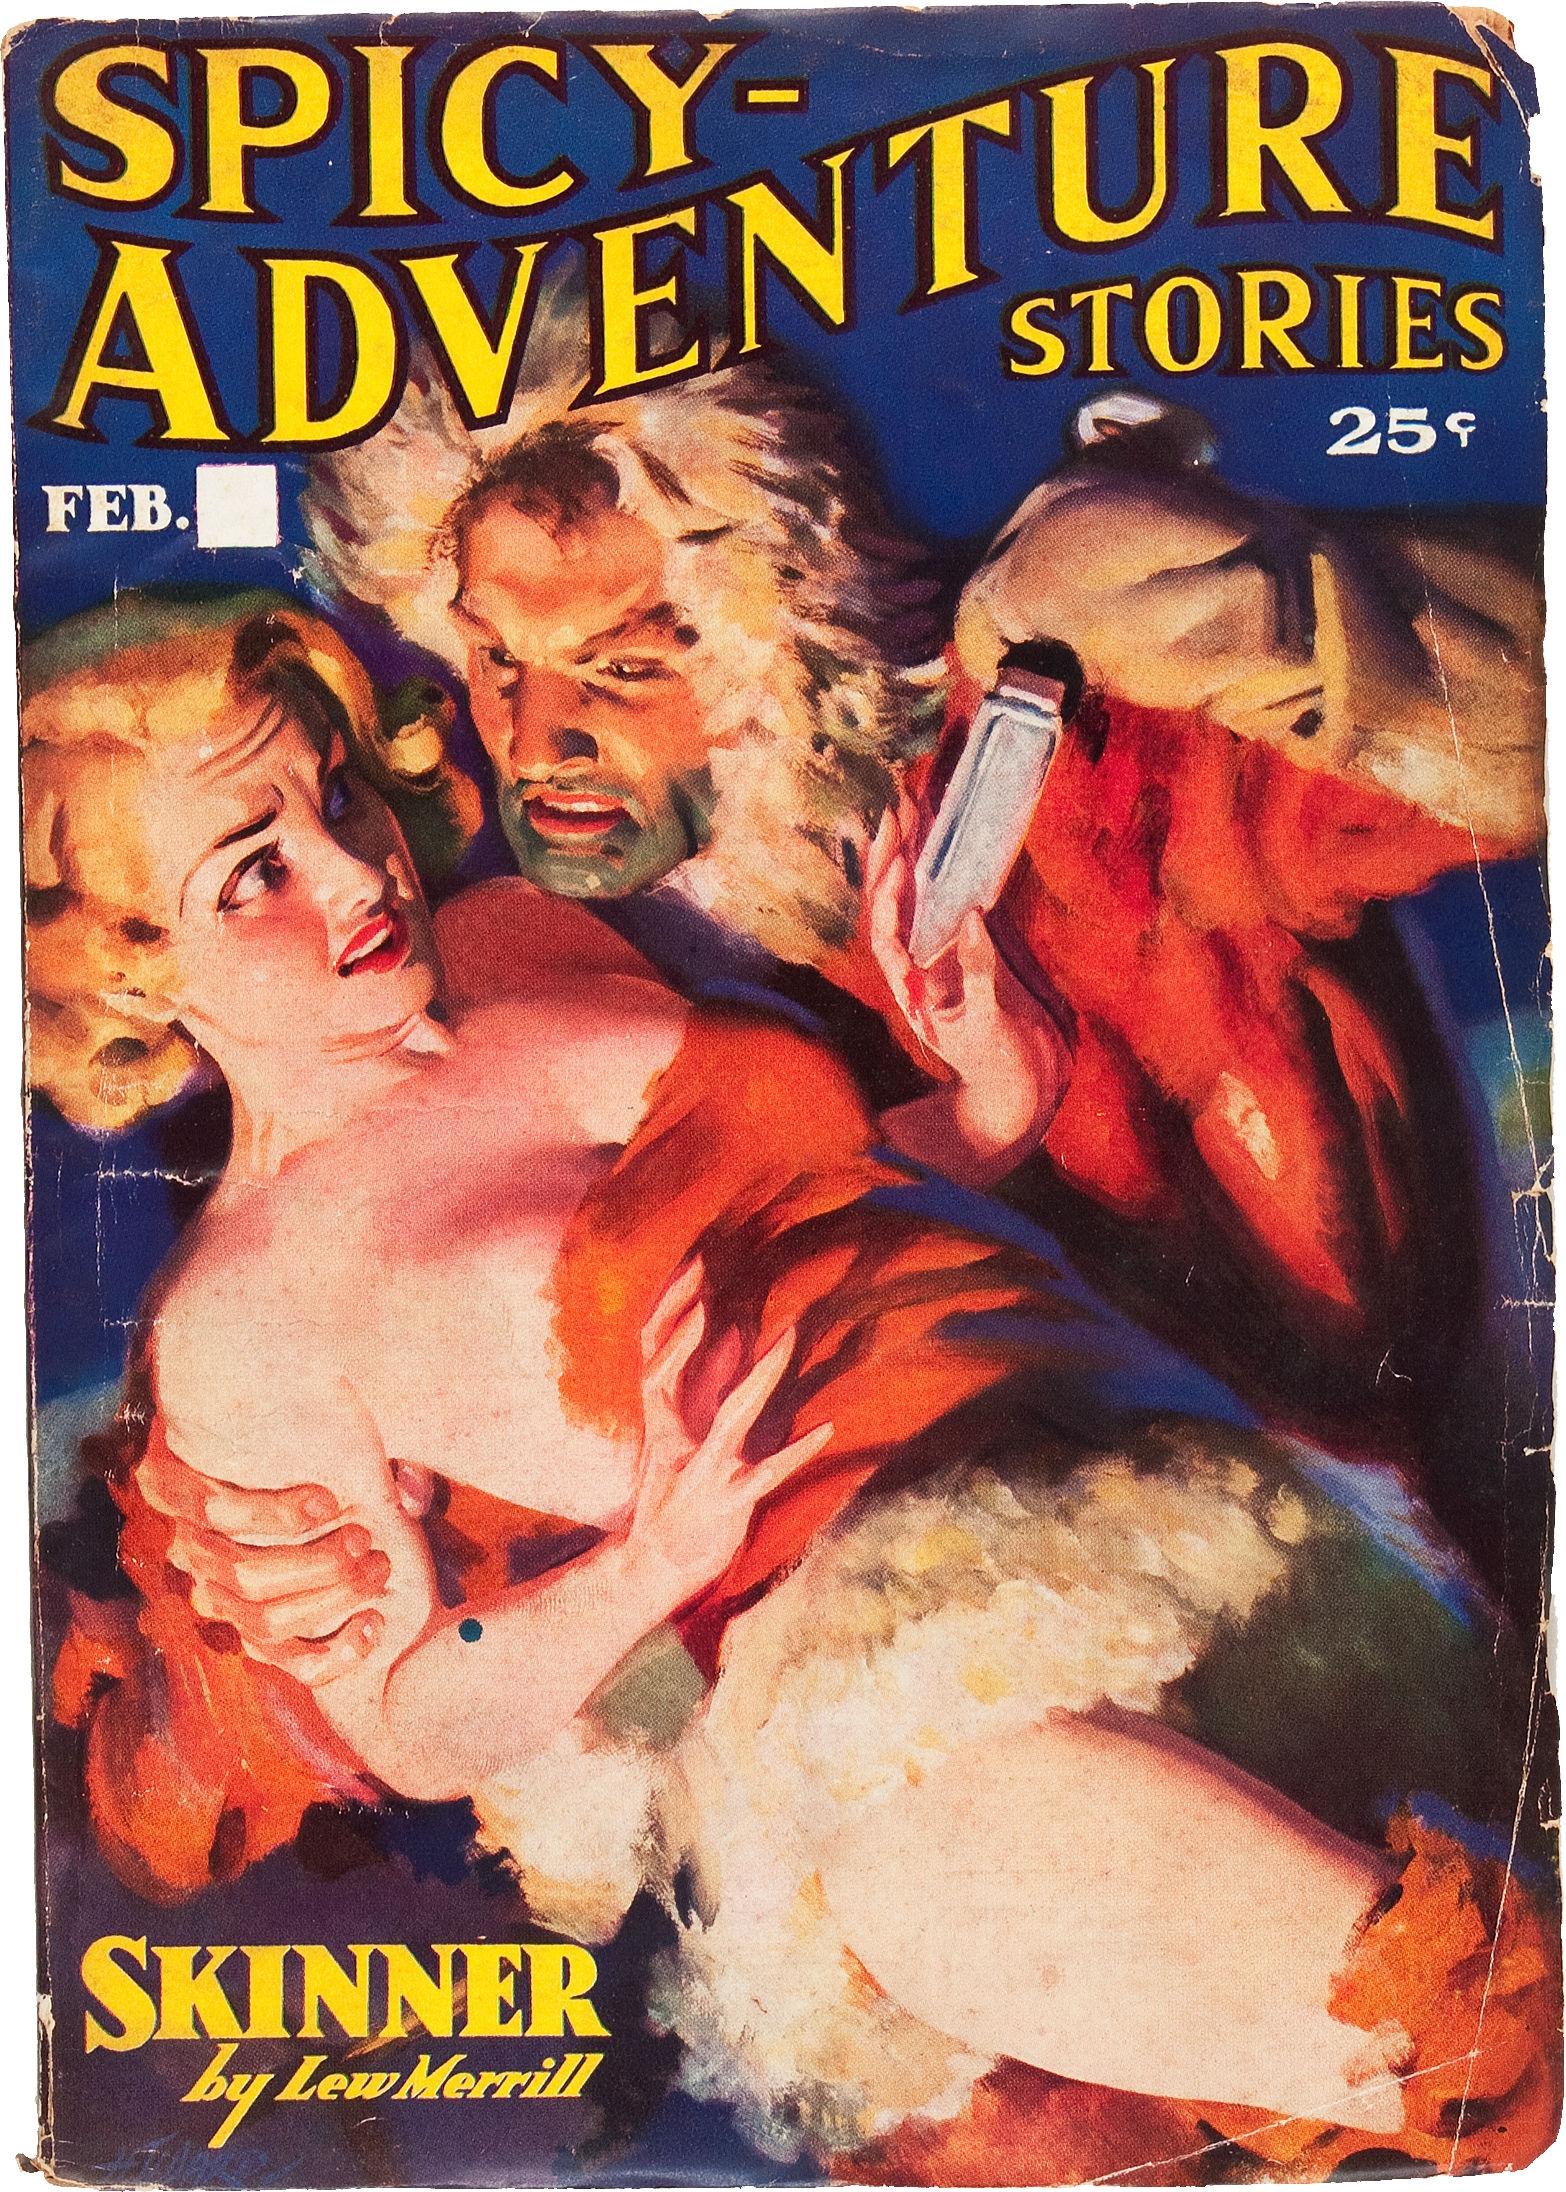 Spicy Adventure Stories - February 1937